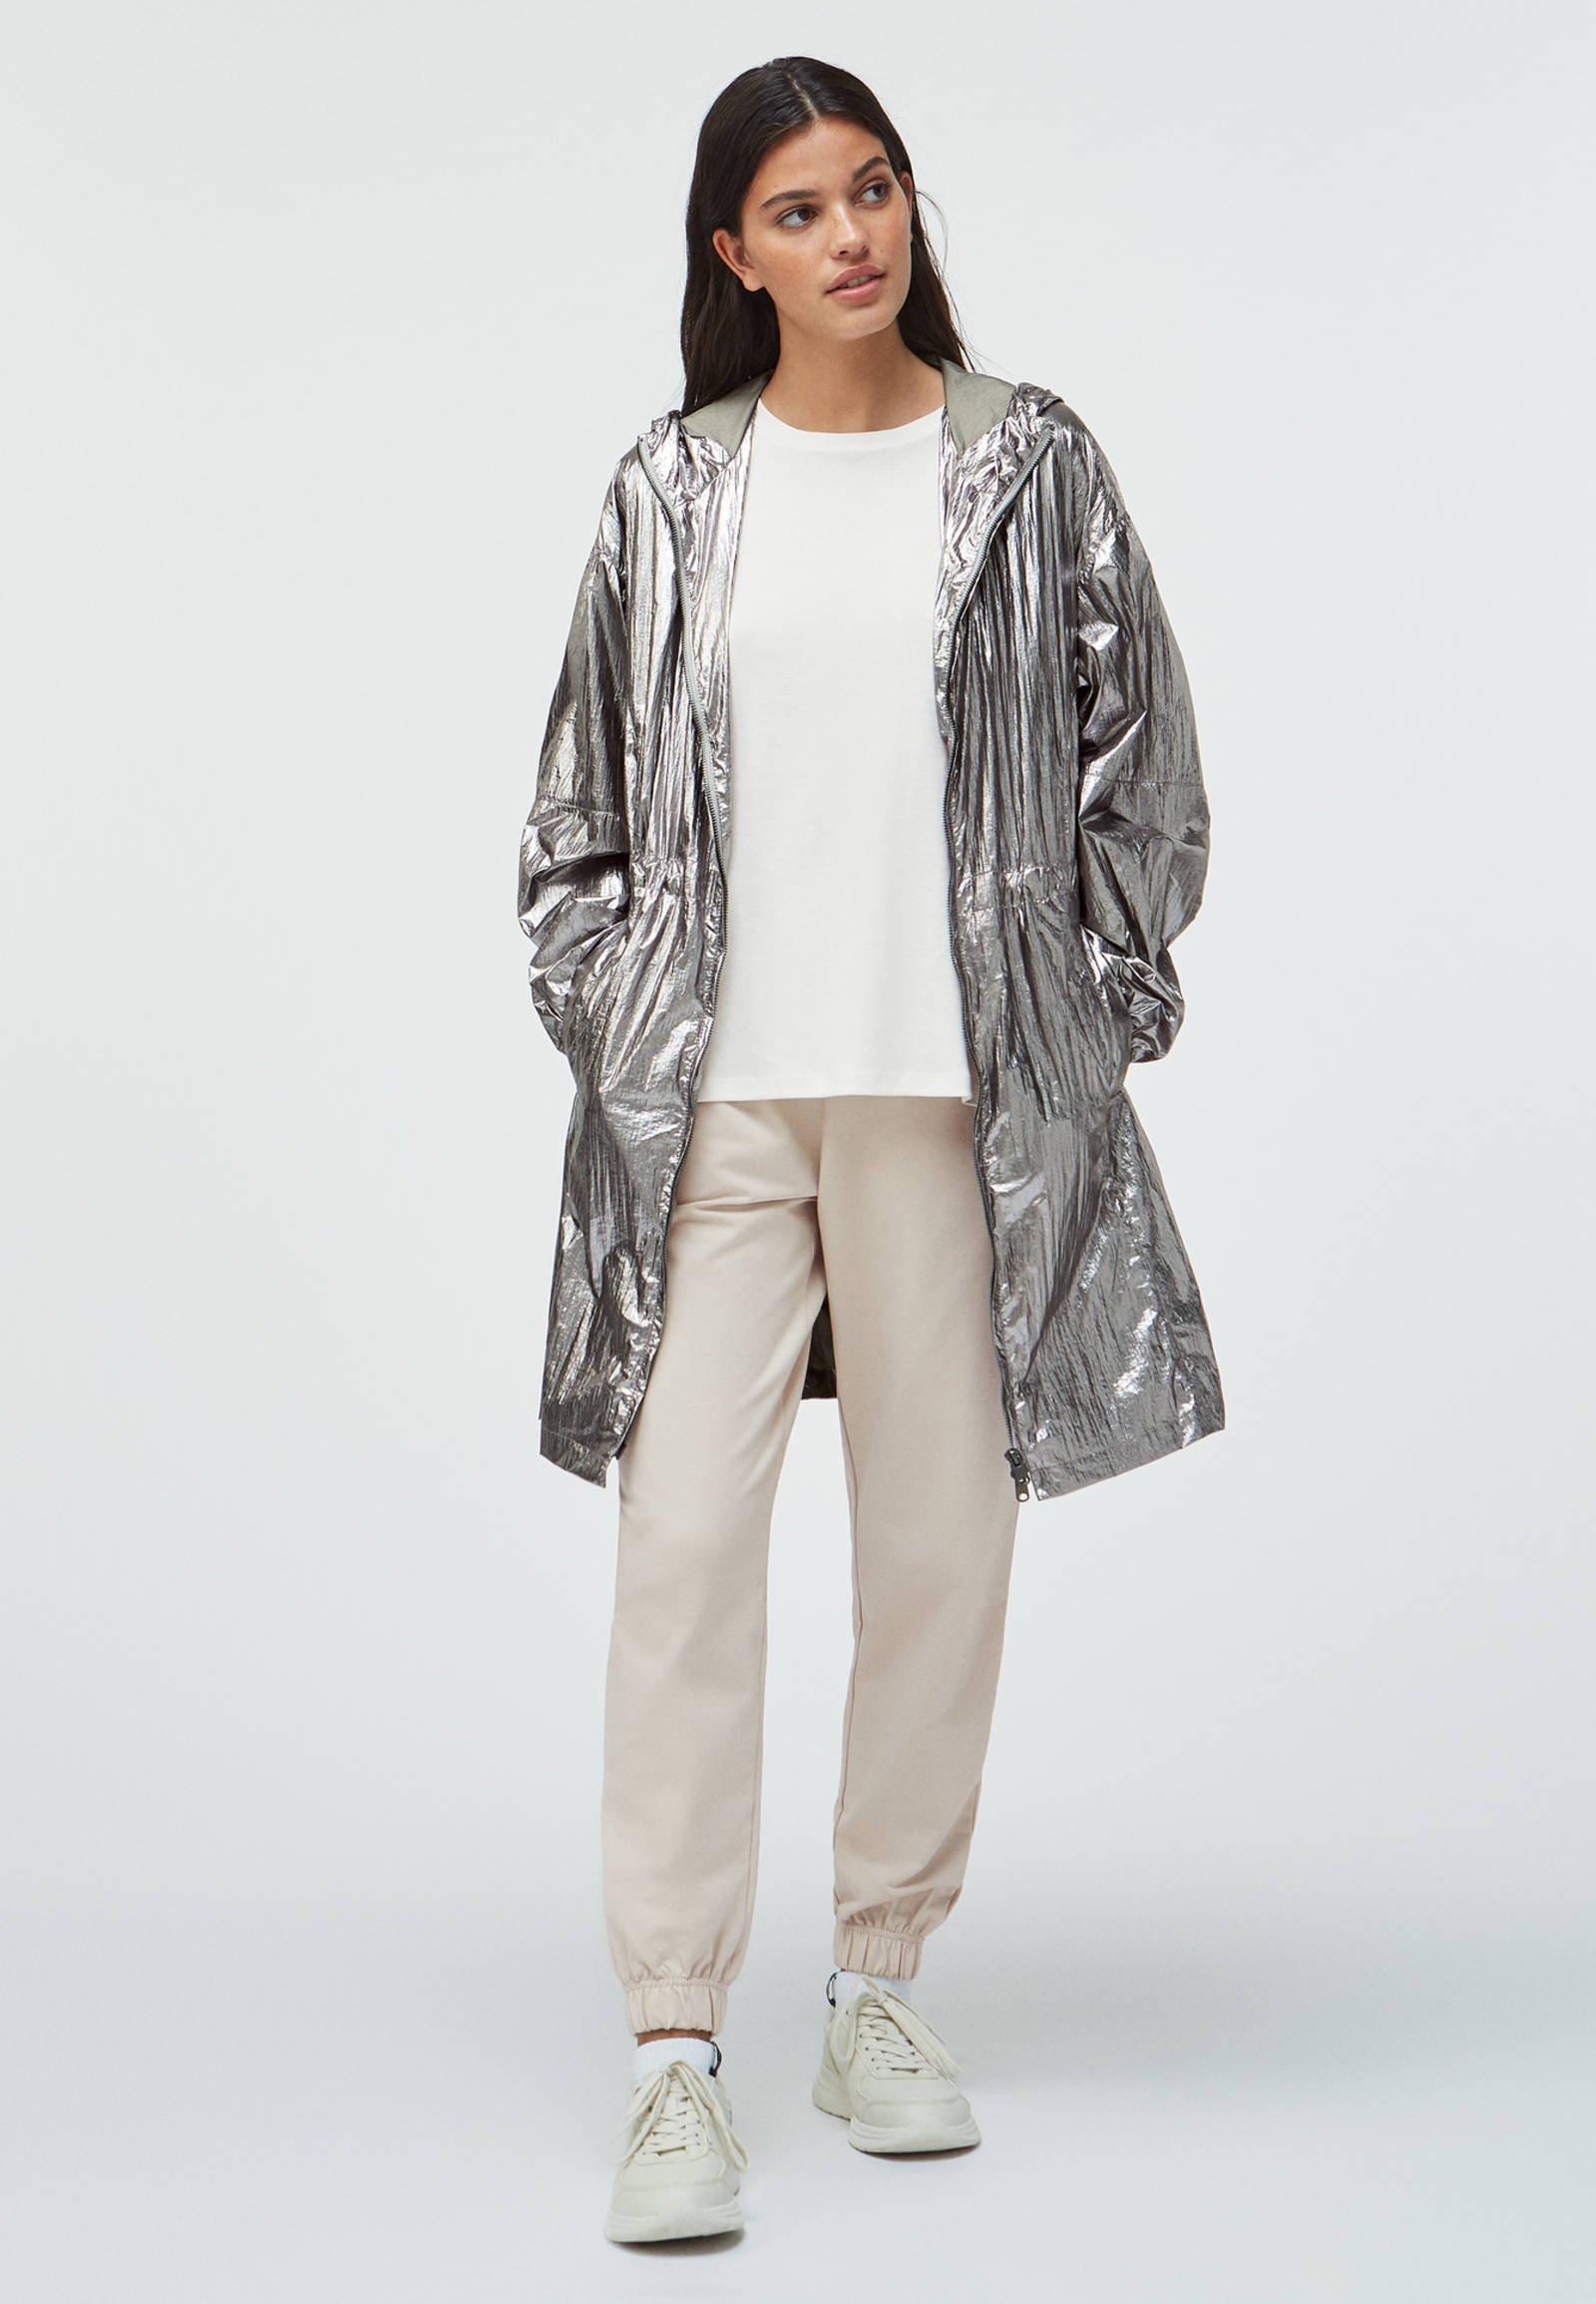 OYSHO_SPORT Parka - silver - Manteaux Femme B0YTr